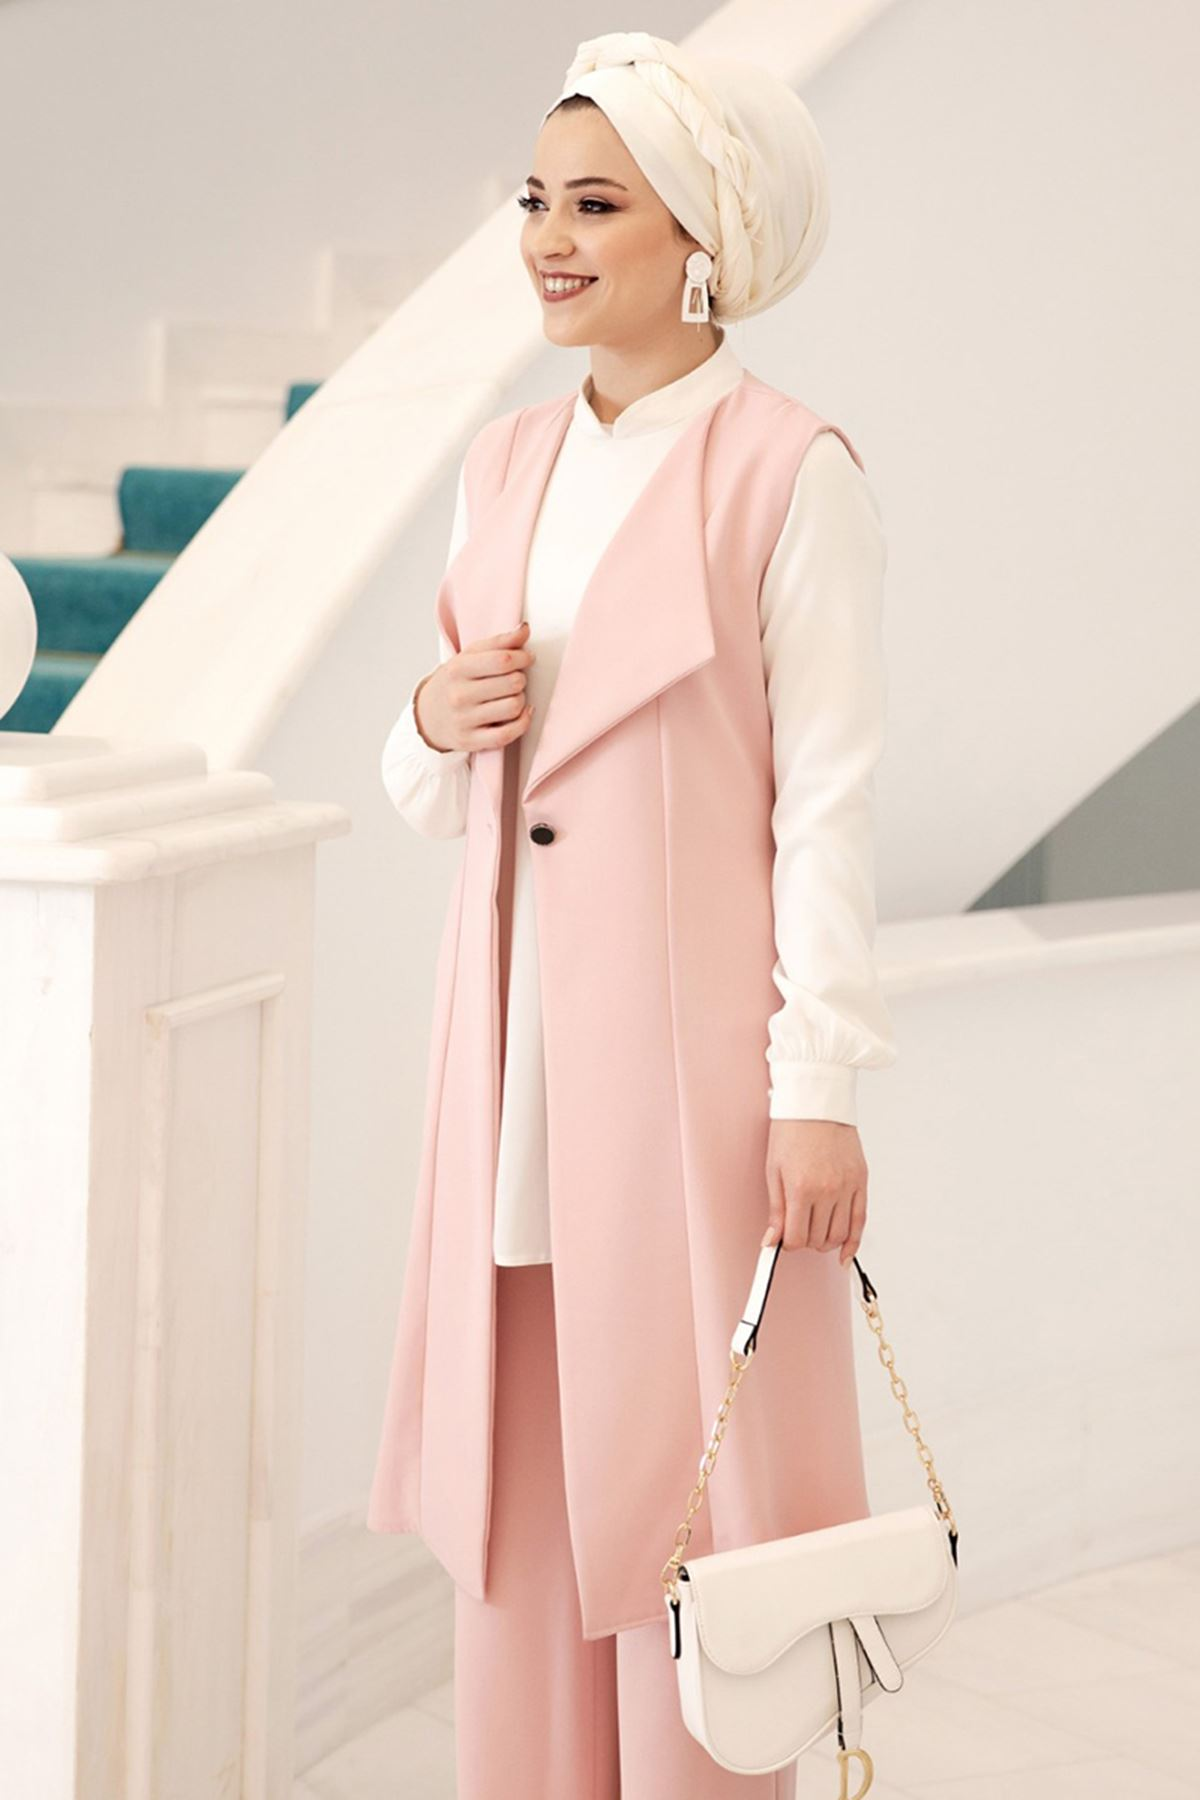 Dresslife - Elit Üçlü Takım Pudra